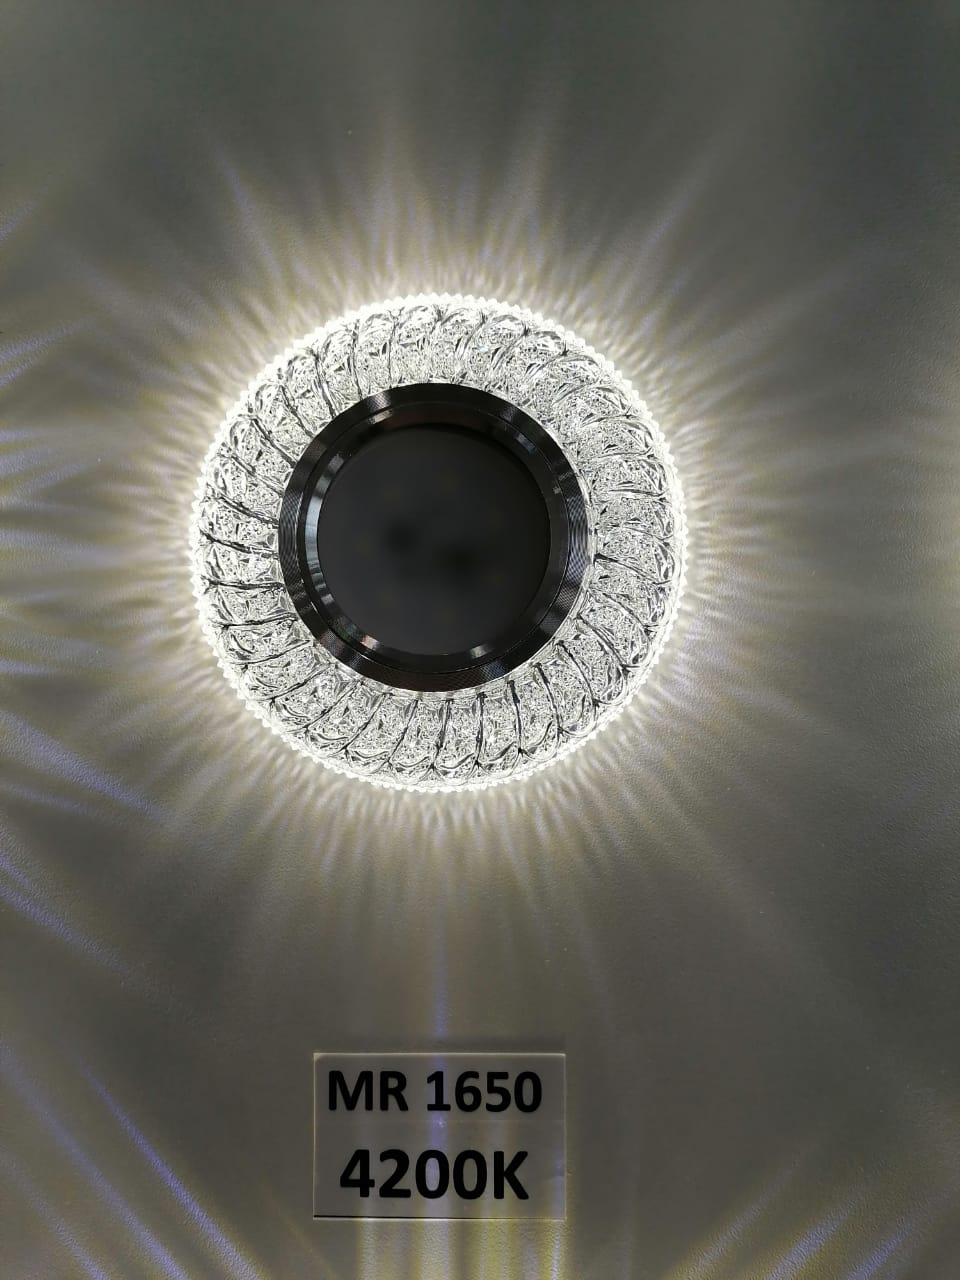 MR 1650